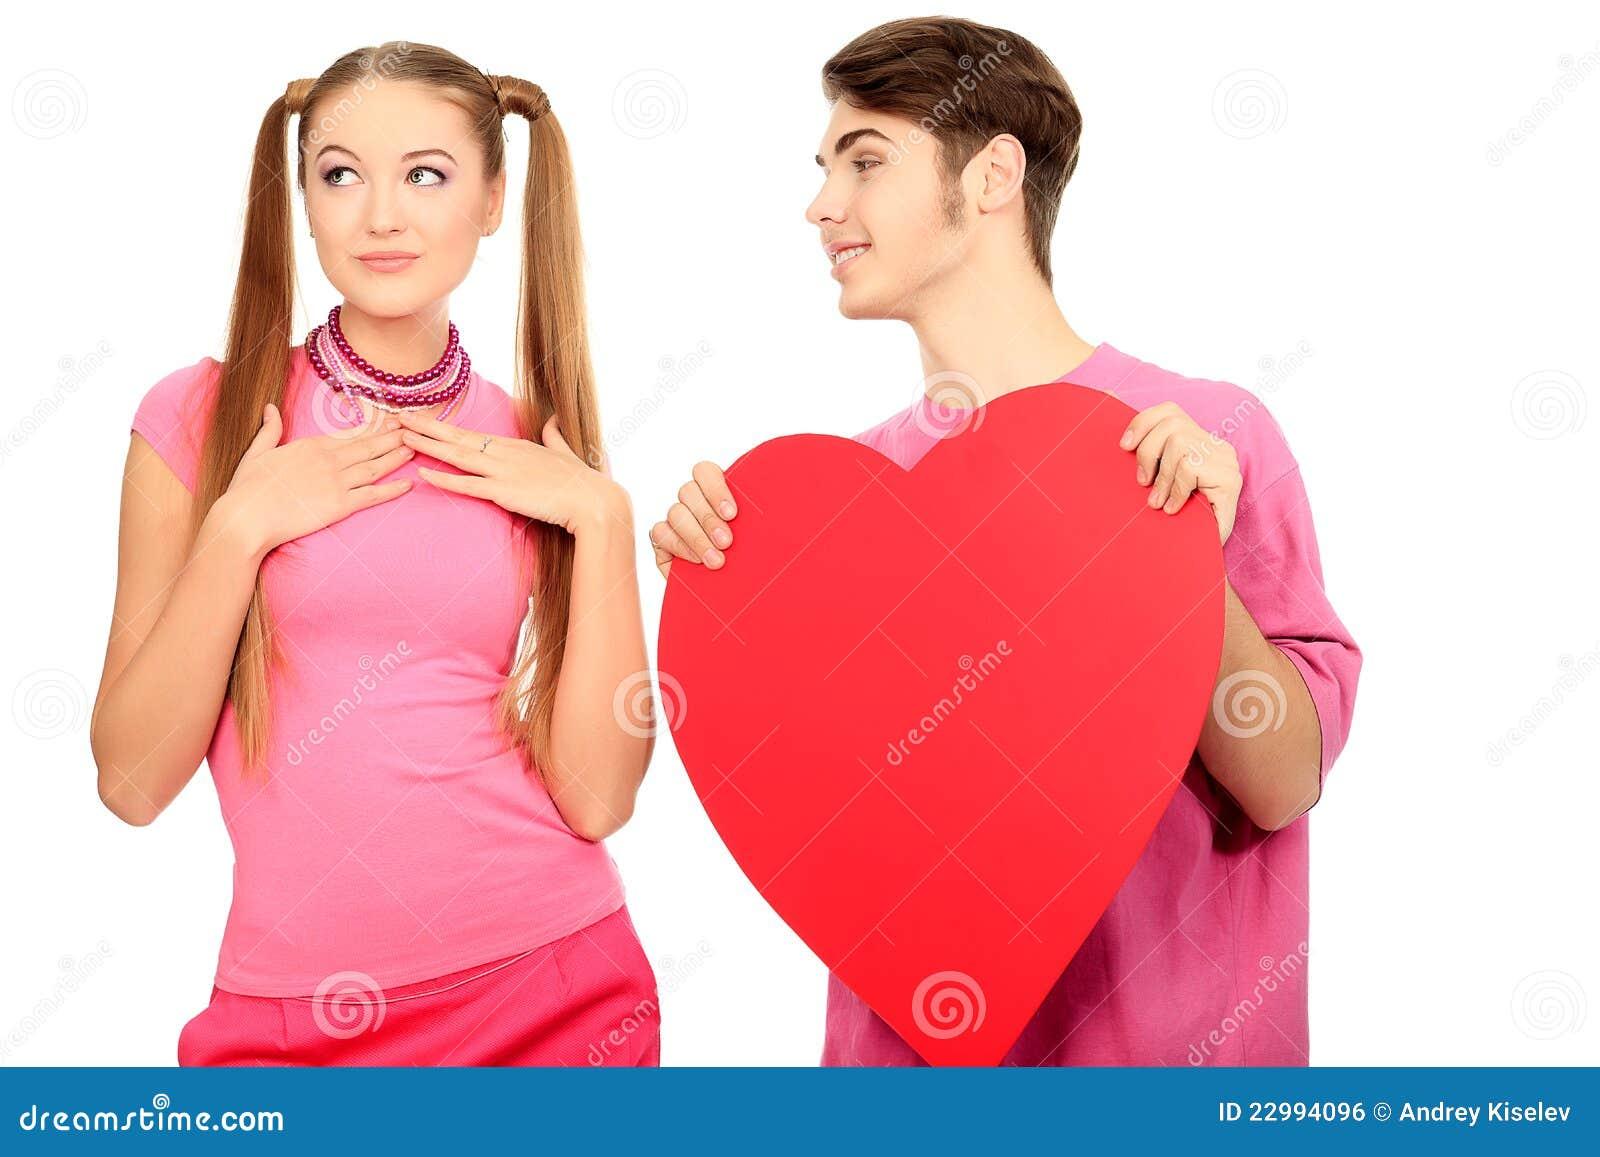 august and nicki minaj dating